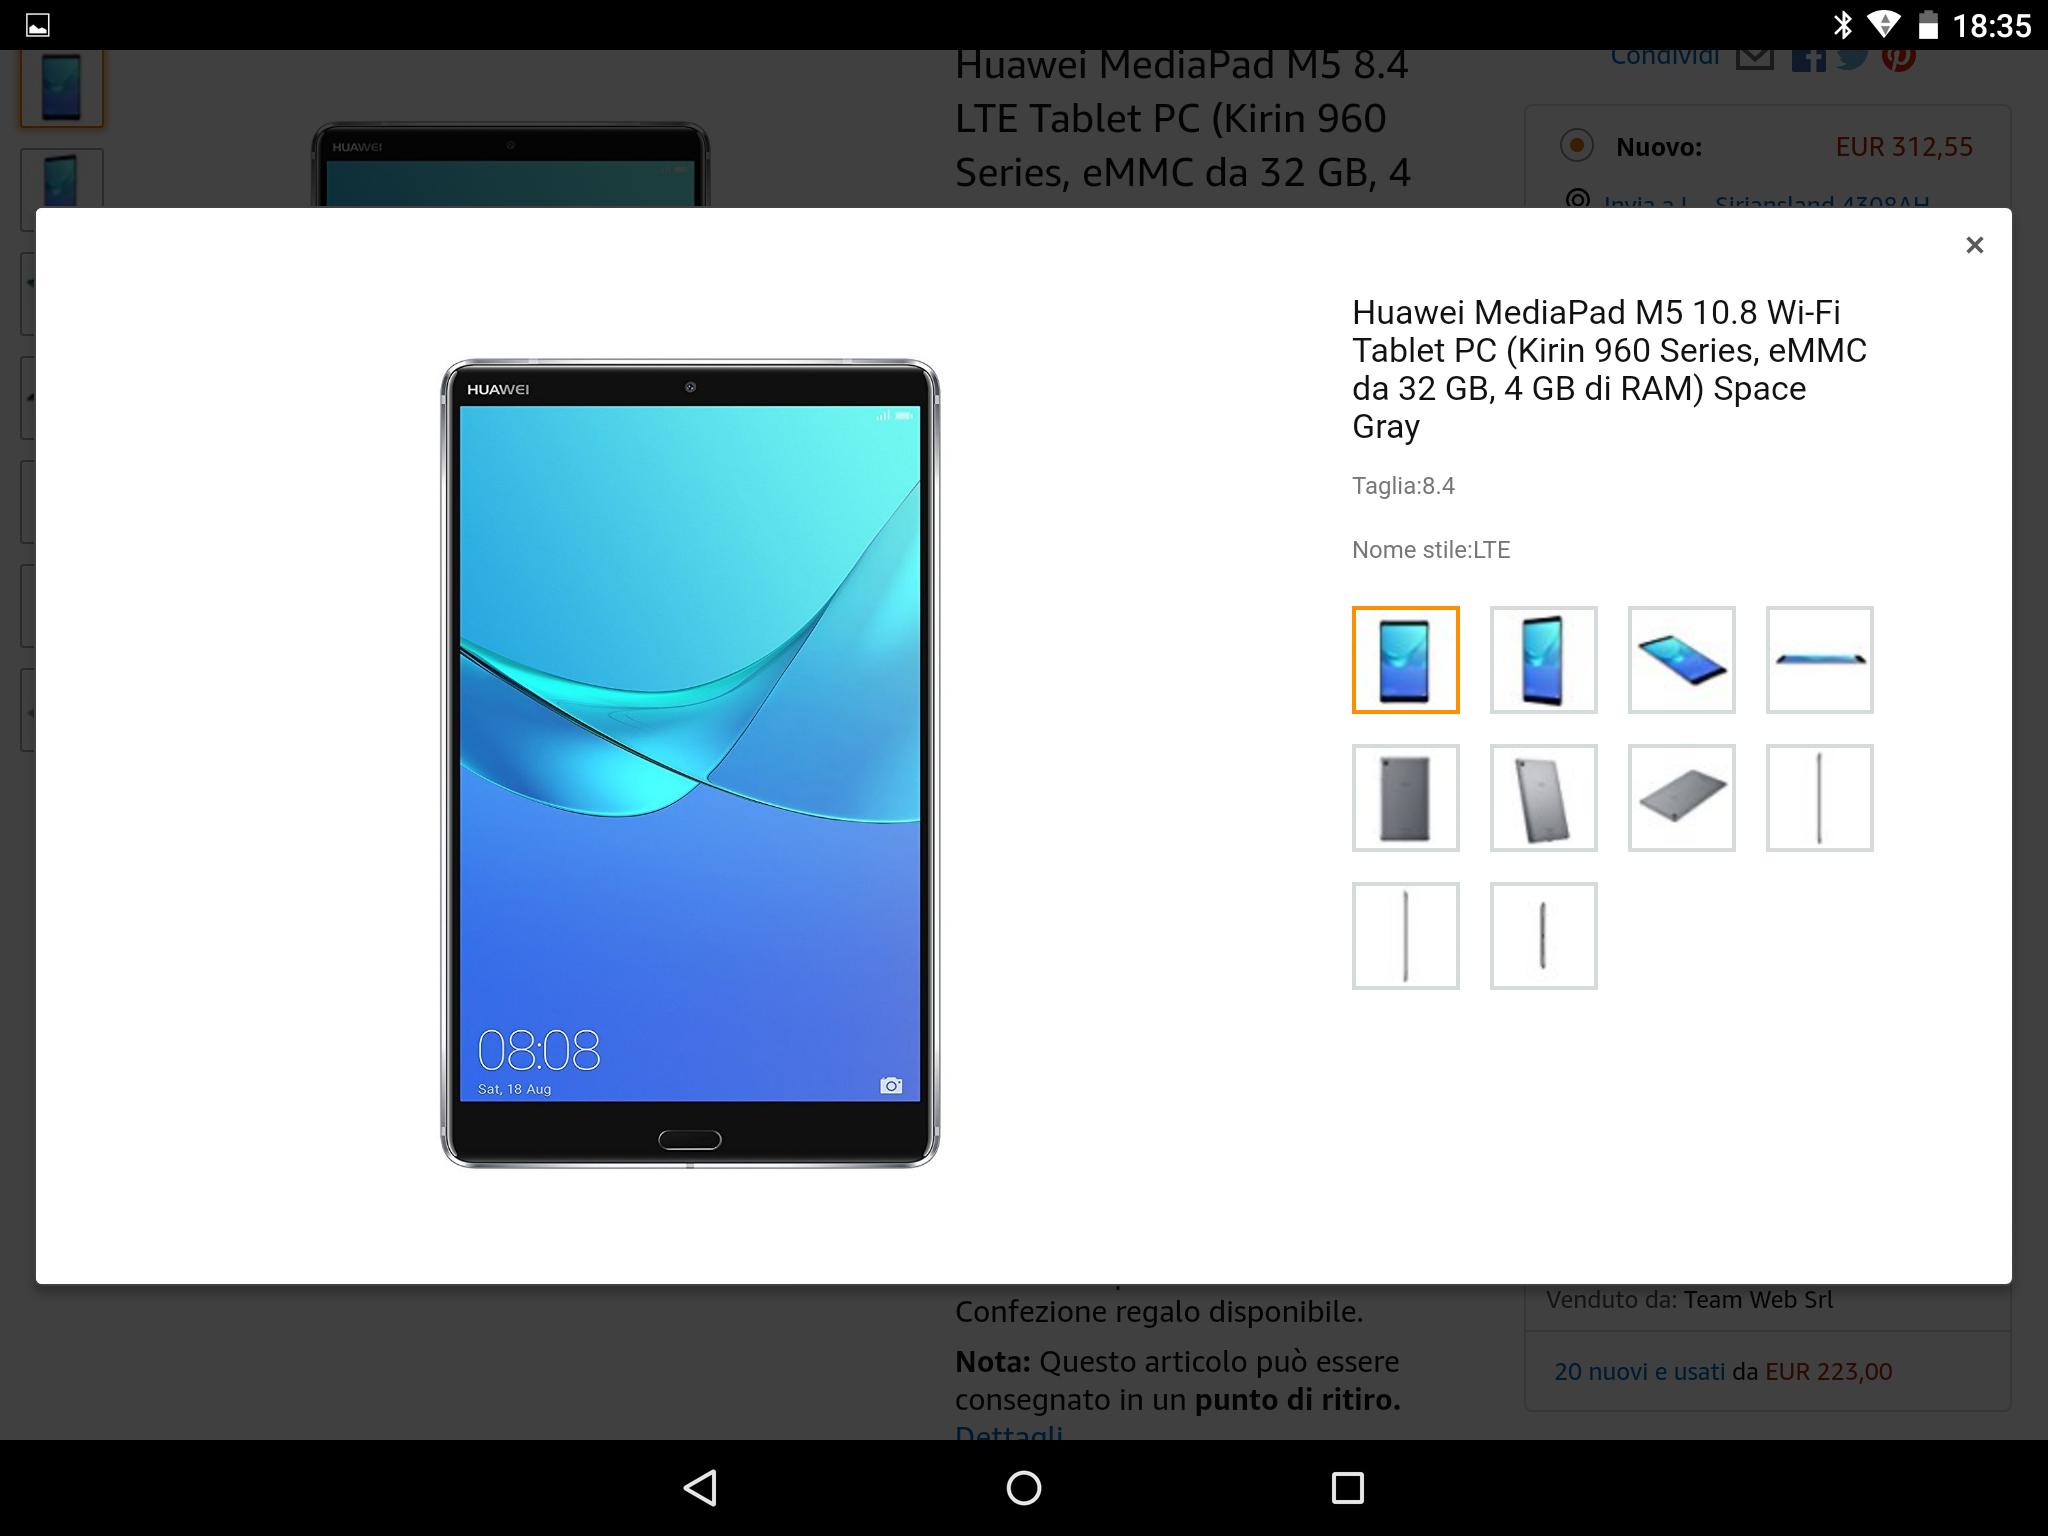 Huawei Mediapad M5 8.4 LTE 309,69 @ Amazon.it